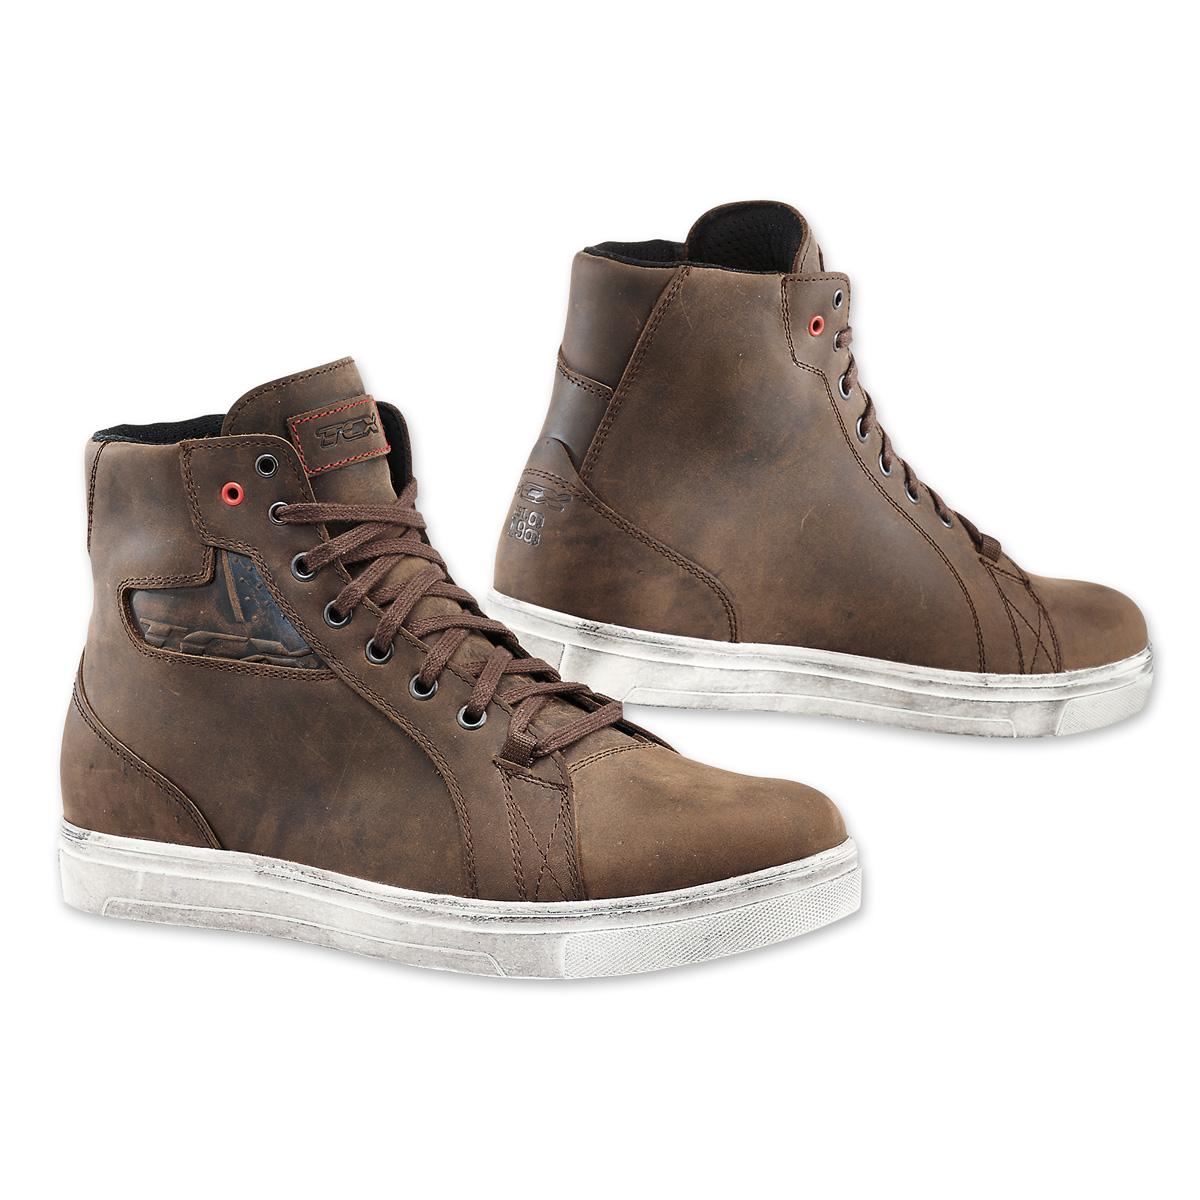 TCX Men's Street Ace Waterproof Dakar Brown Shoes